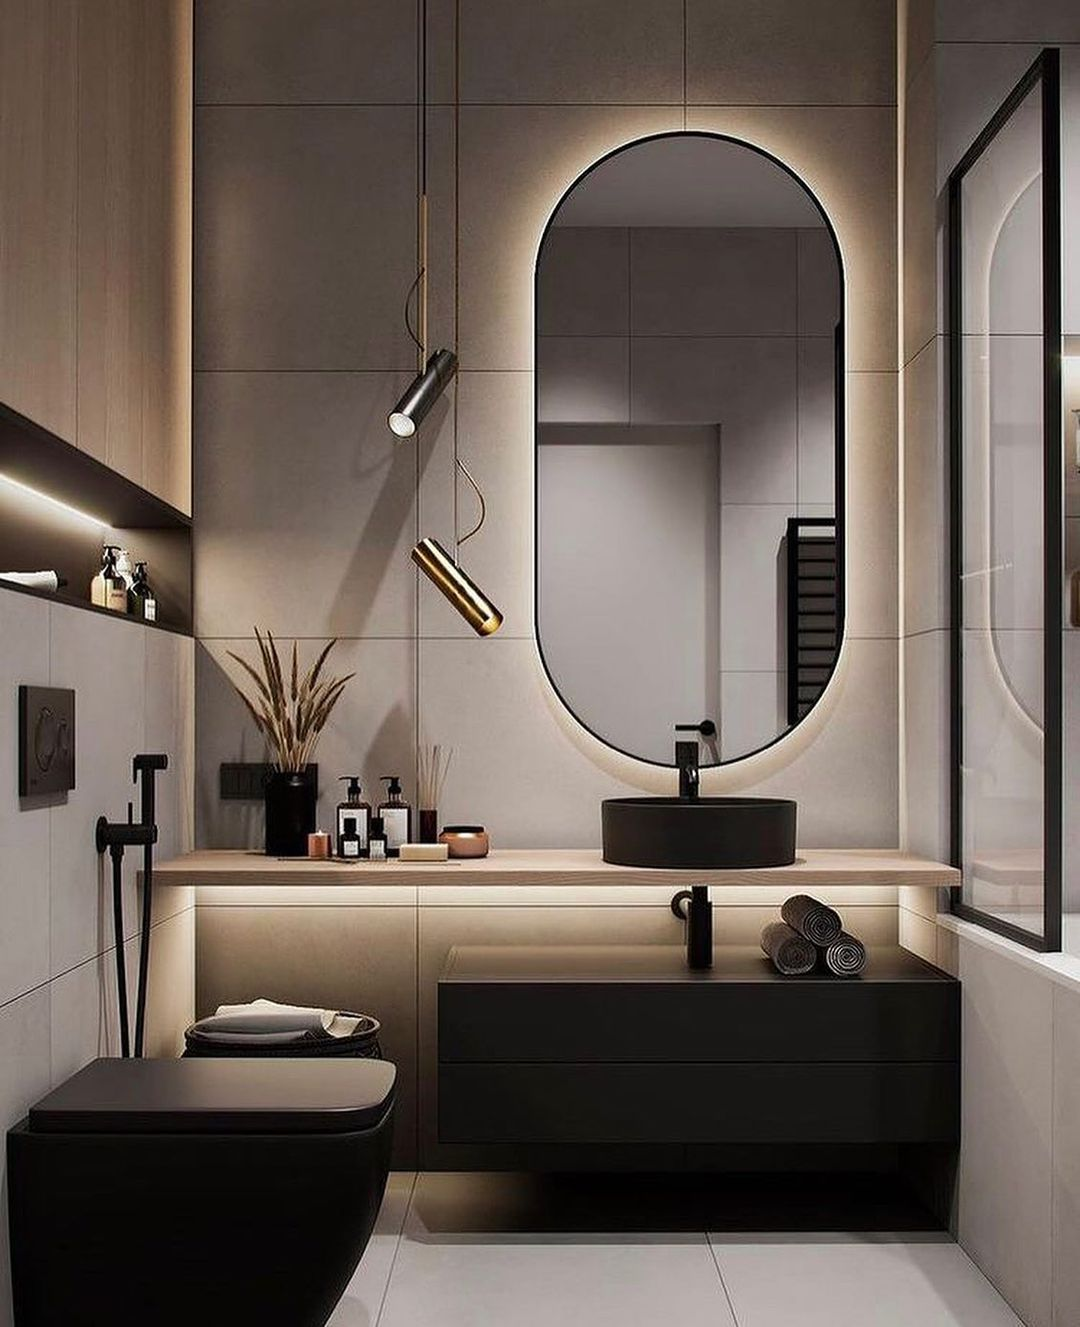 30 Best Modern Bathroom Ideas In 2021 In 2021 Bathroom Interior Design Washroom Design Modern Bathroom Design Bathroom design ideas 2021